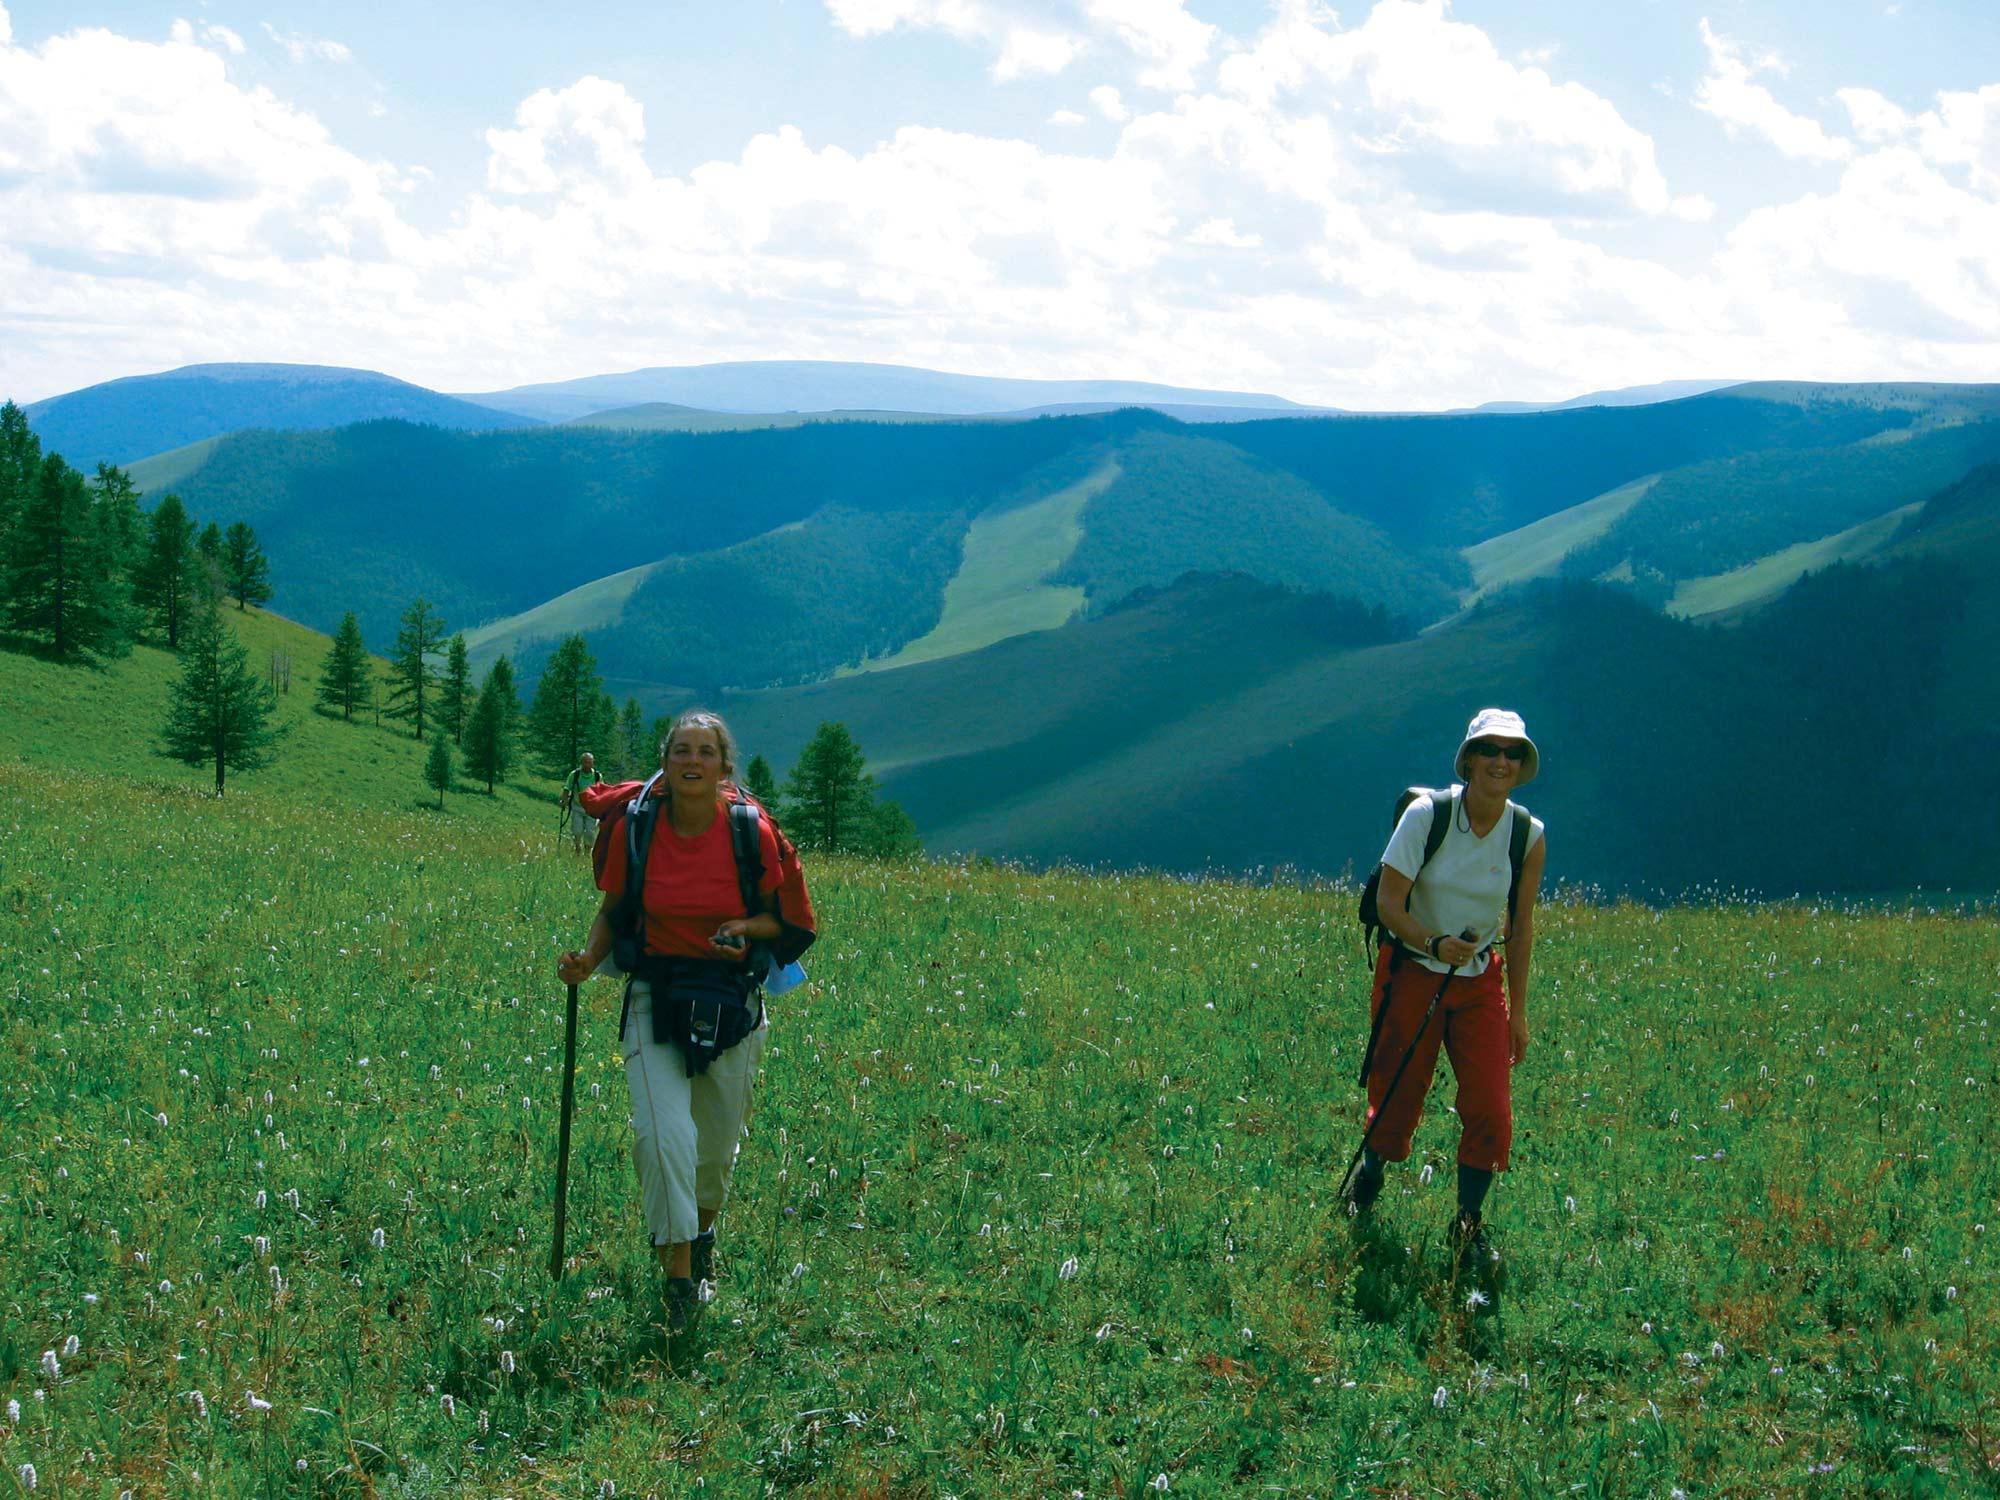 GERtoGER-Geotourism-Mongolia-_-Trekking-